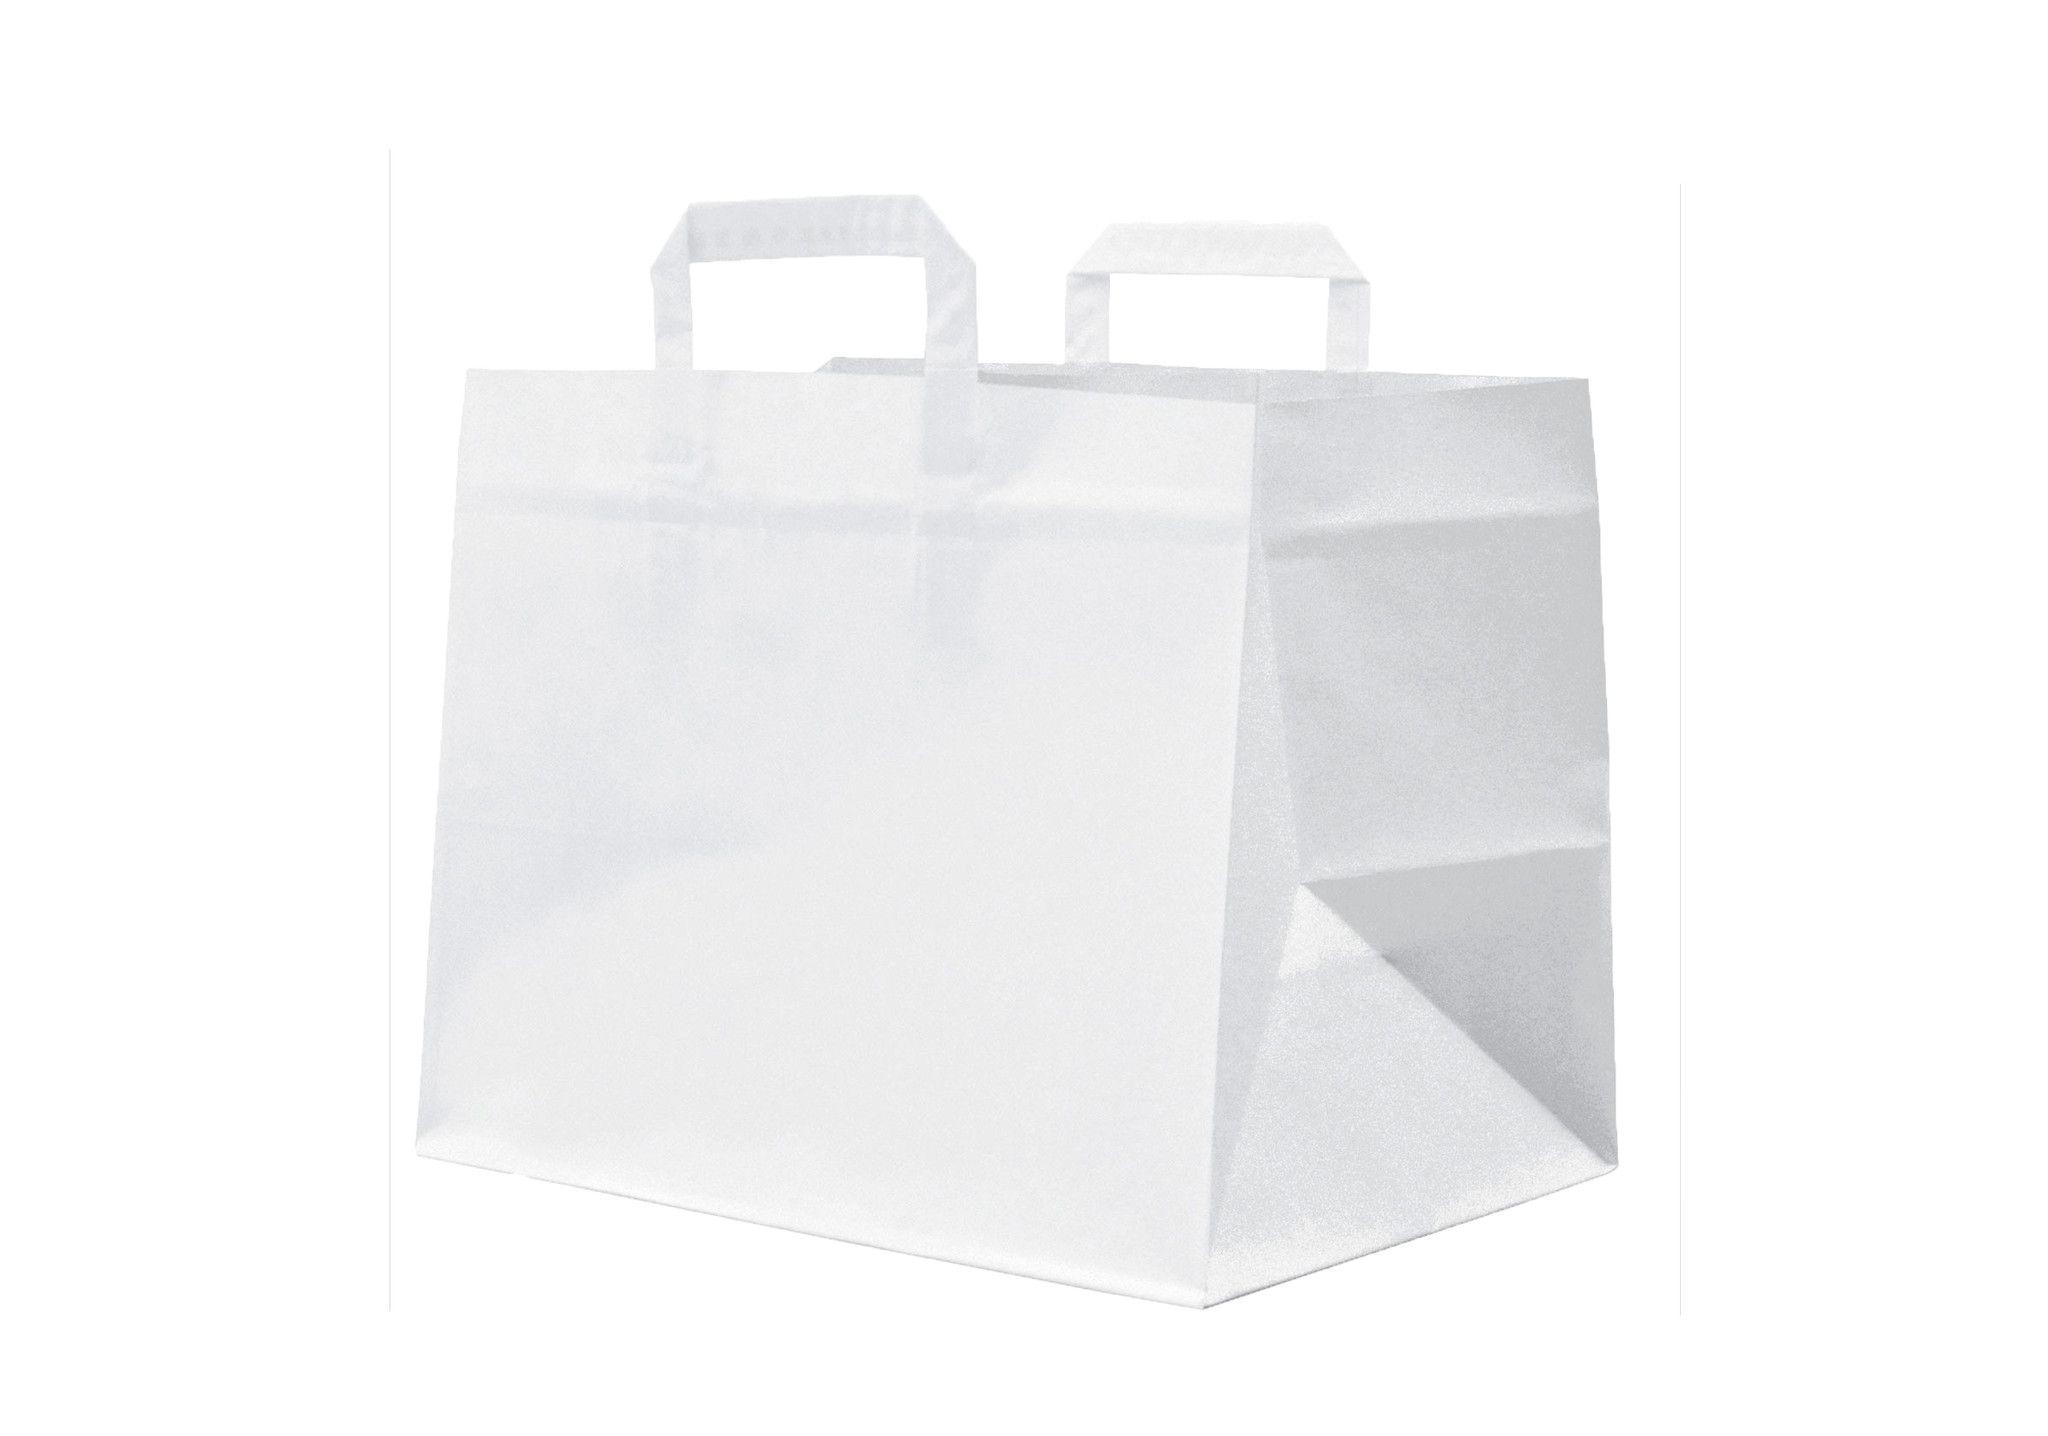 Shopper carta kraft bianco stampato take away manico piattina in carta 27+17x29 cm gr. 90